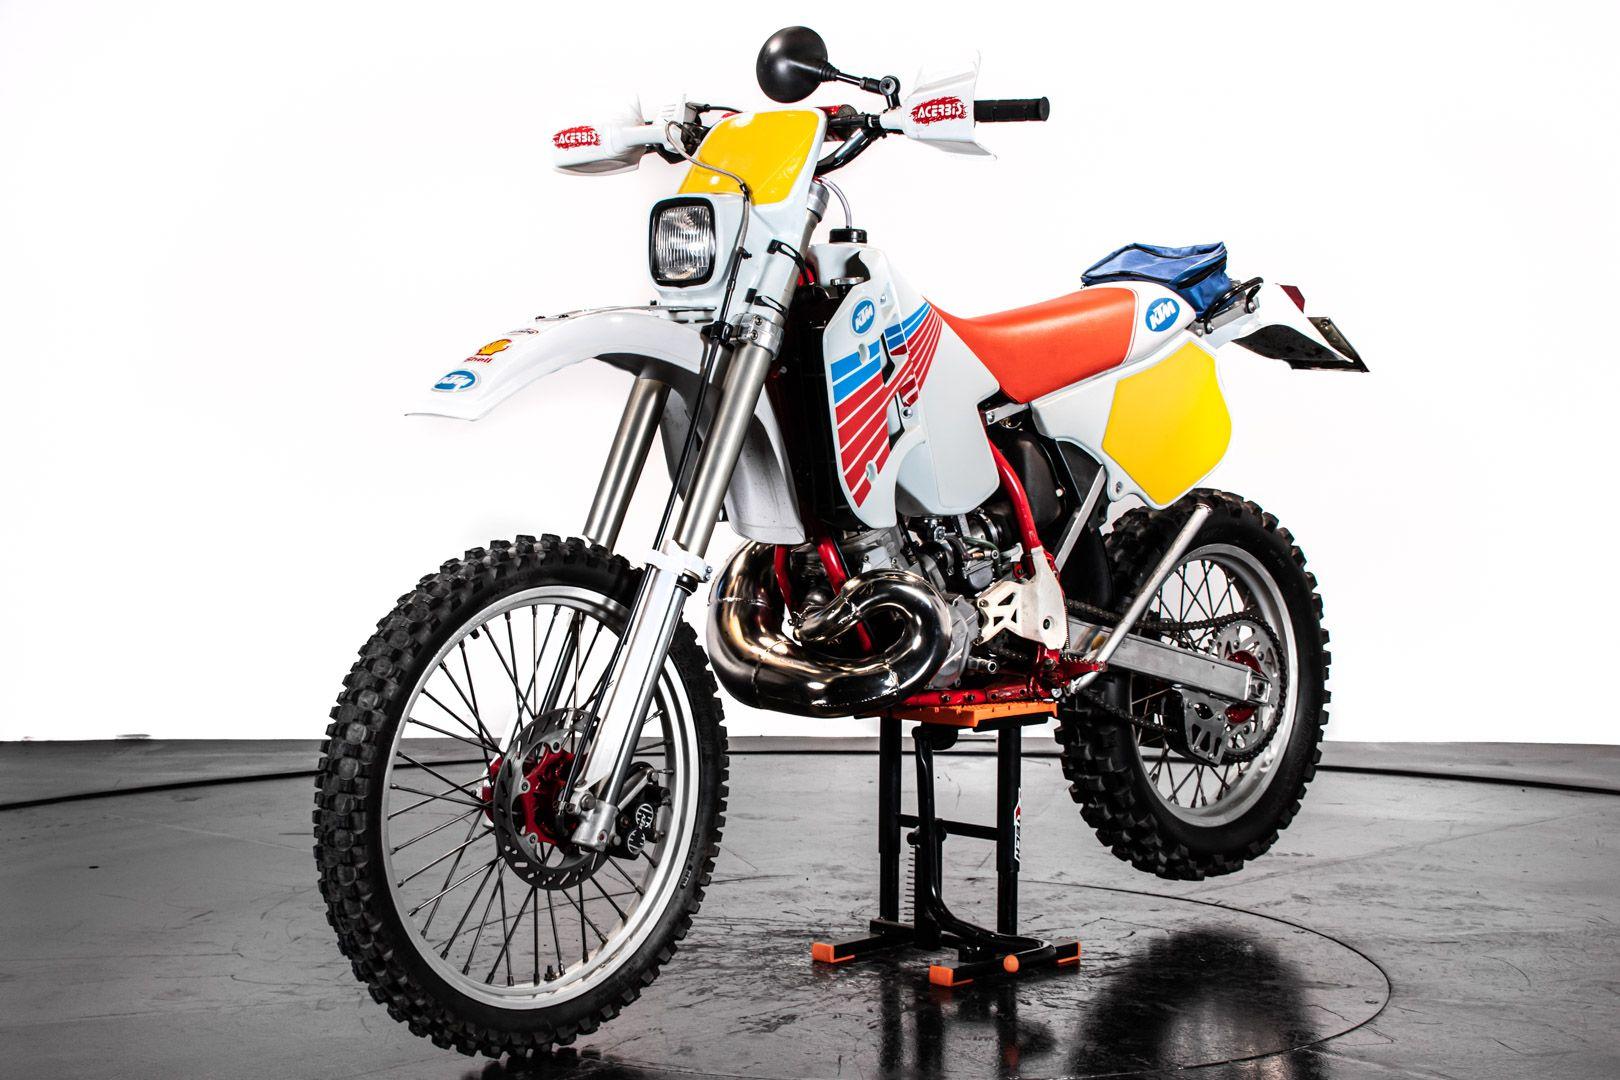 1991 KTM GS 250 82475